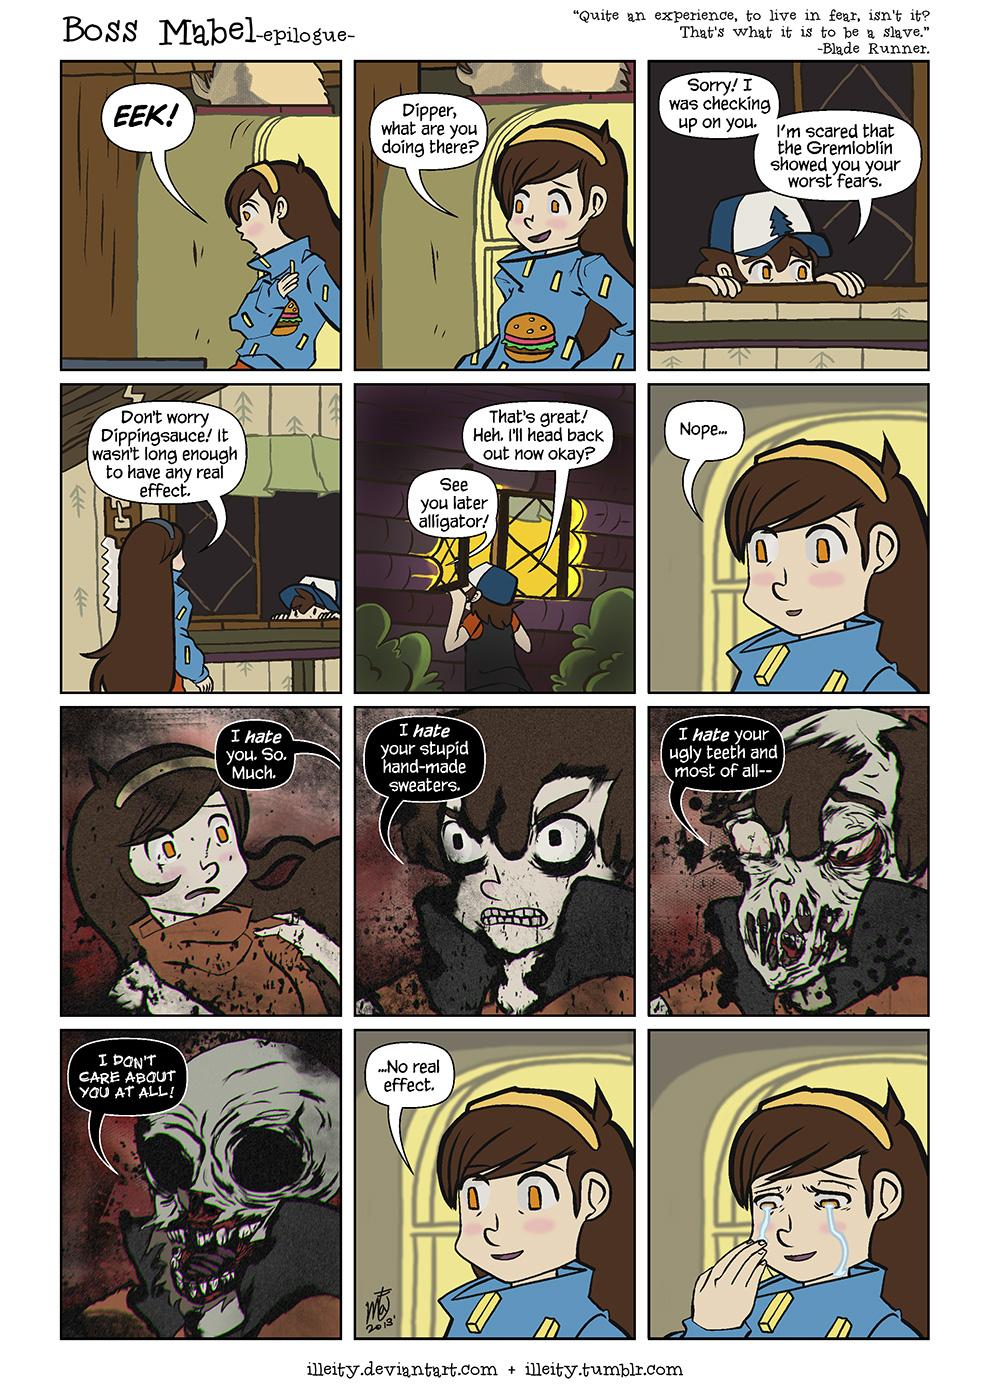 Boss Mabel -epilogue- by illeity